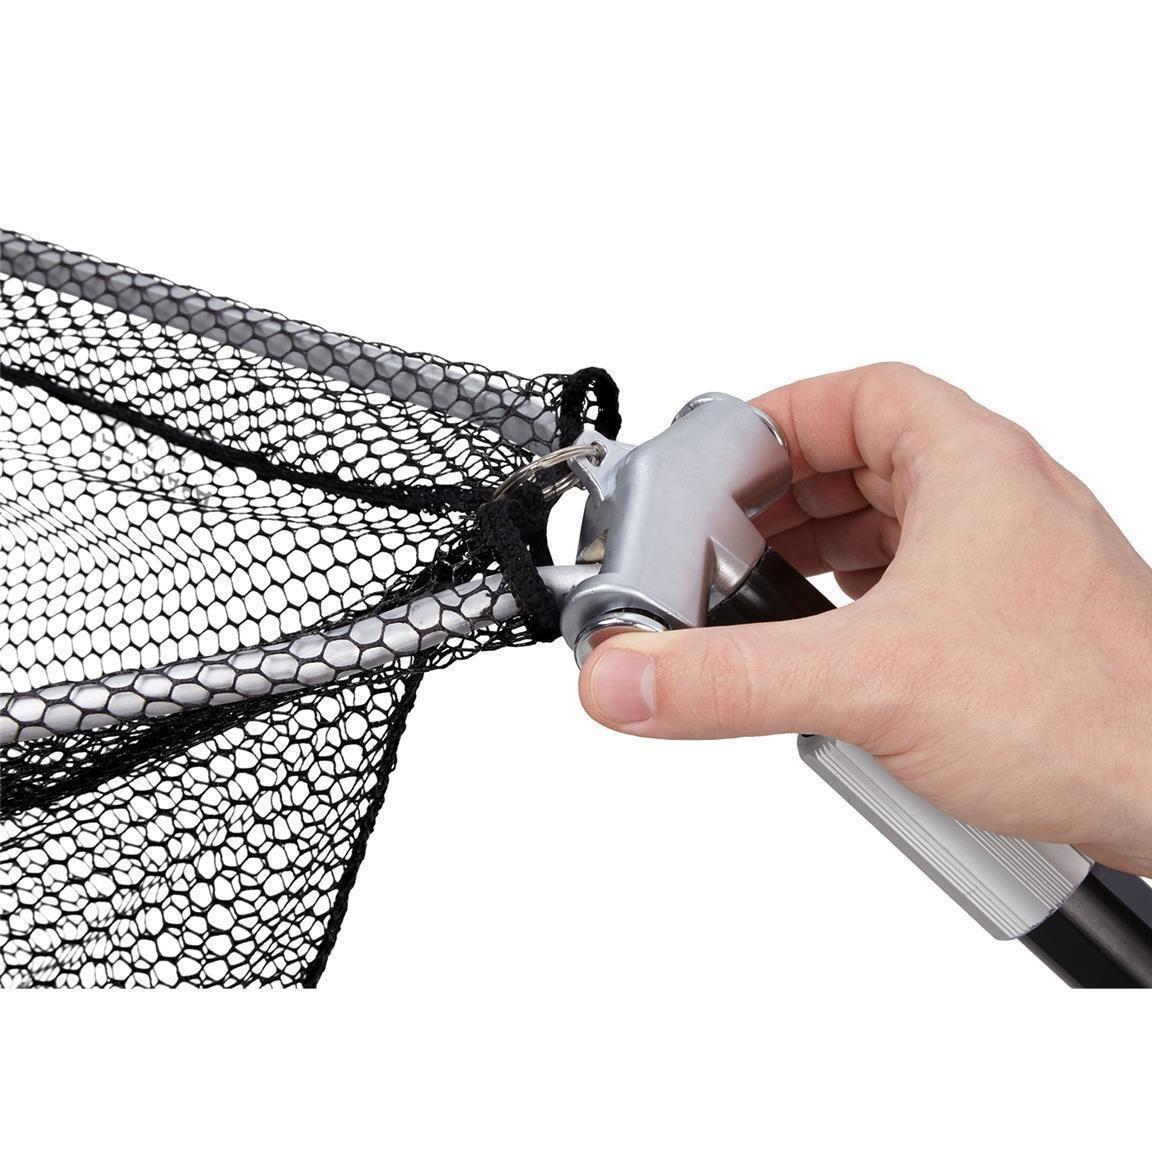 2-teilig  Metallgelenk  in verschiedenen Längen DAM Unterfangkescher  gummiert